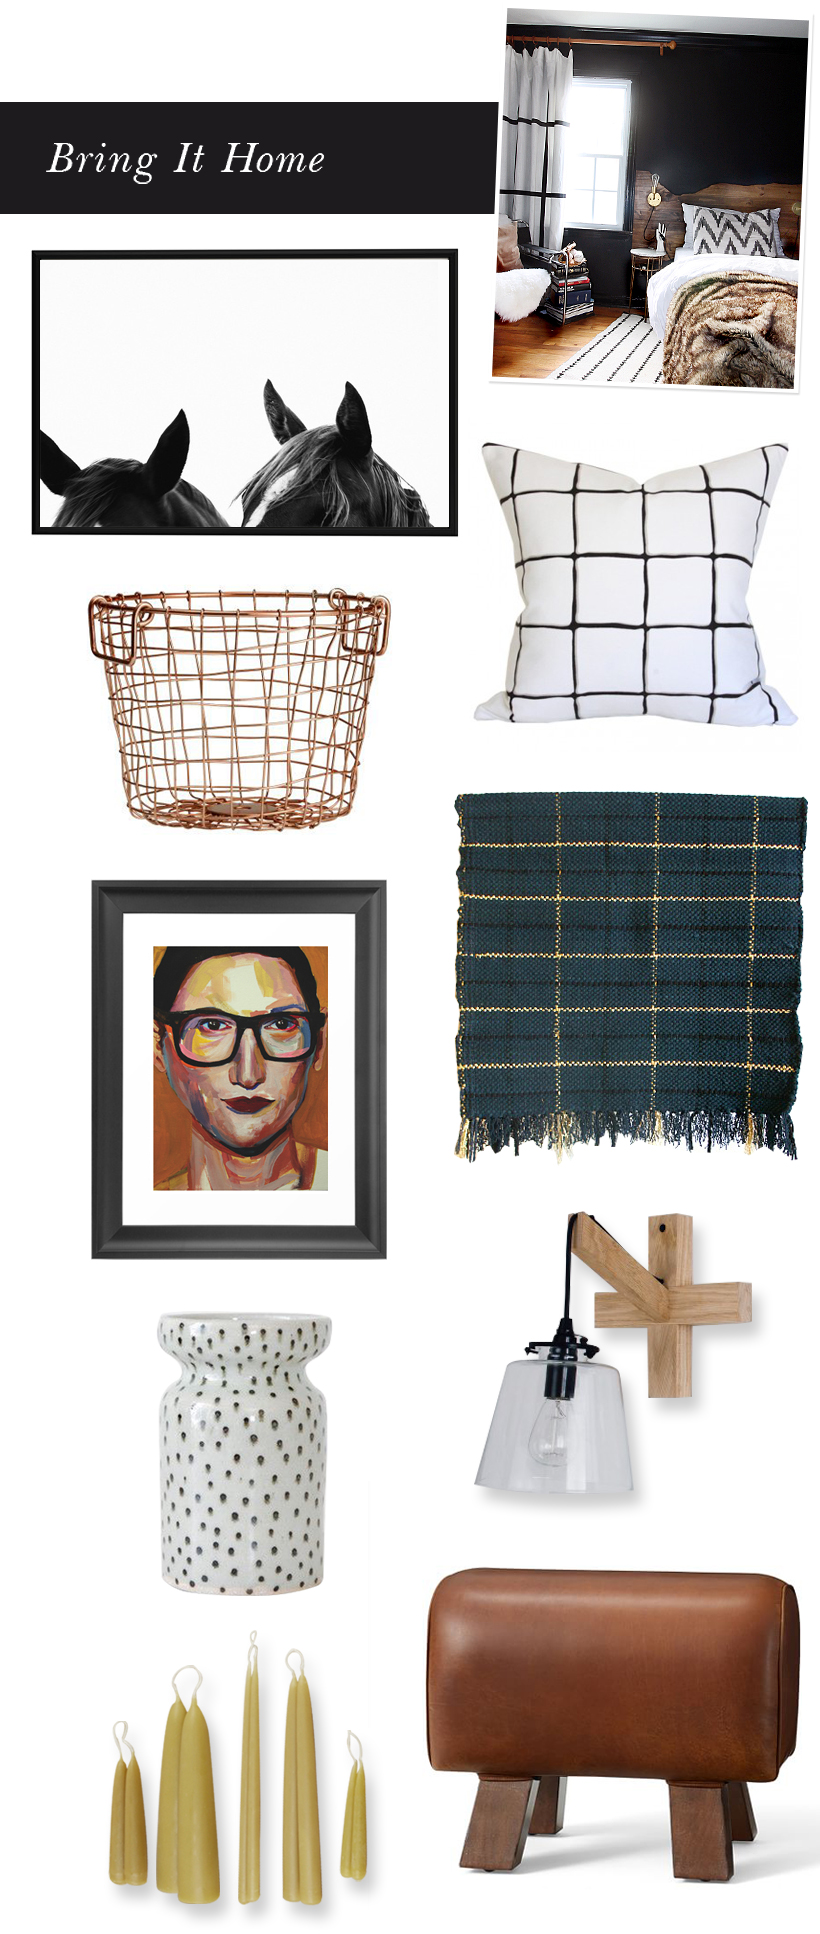 Cozy Fall Bedroom | Bring It Home